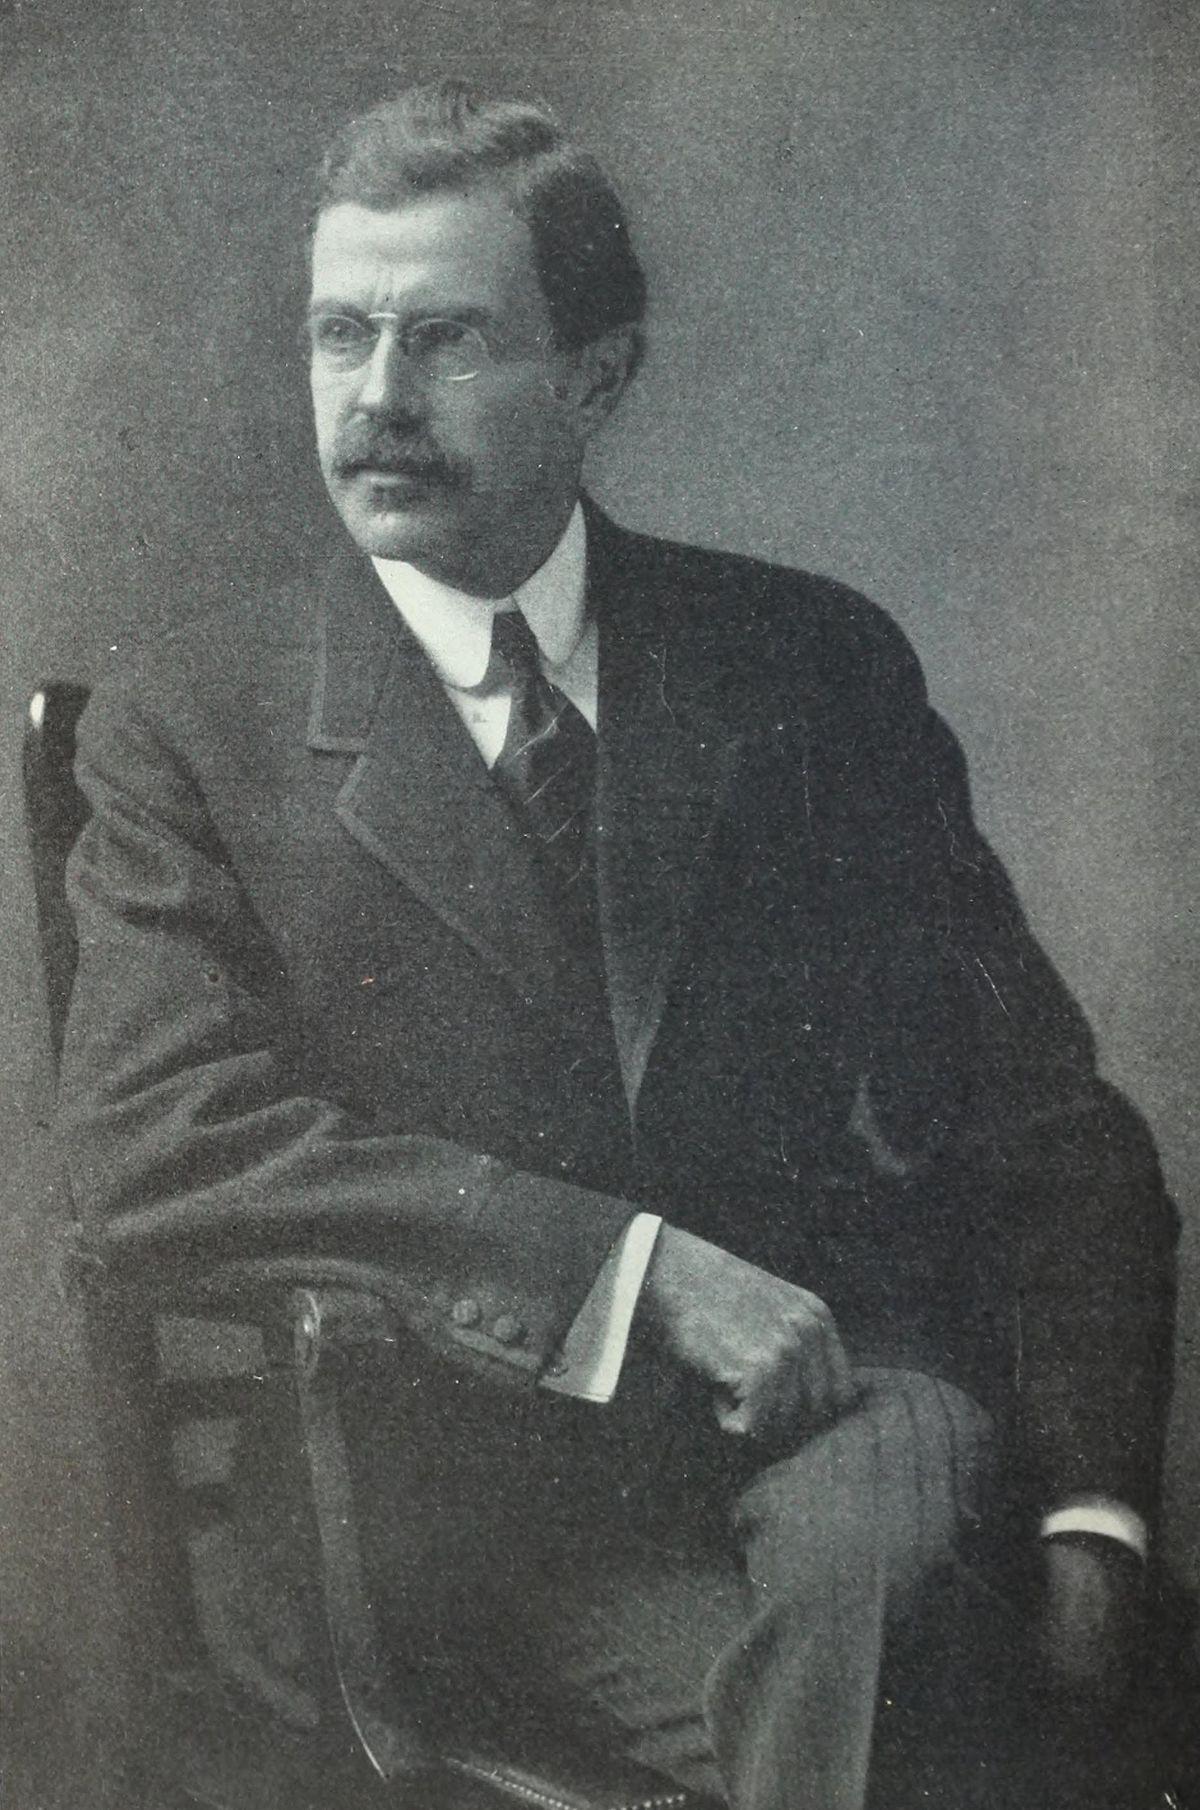 John Grier Hibben Wikipedia